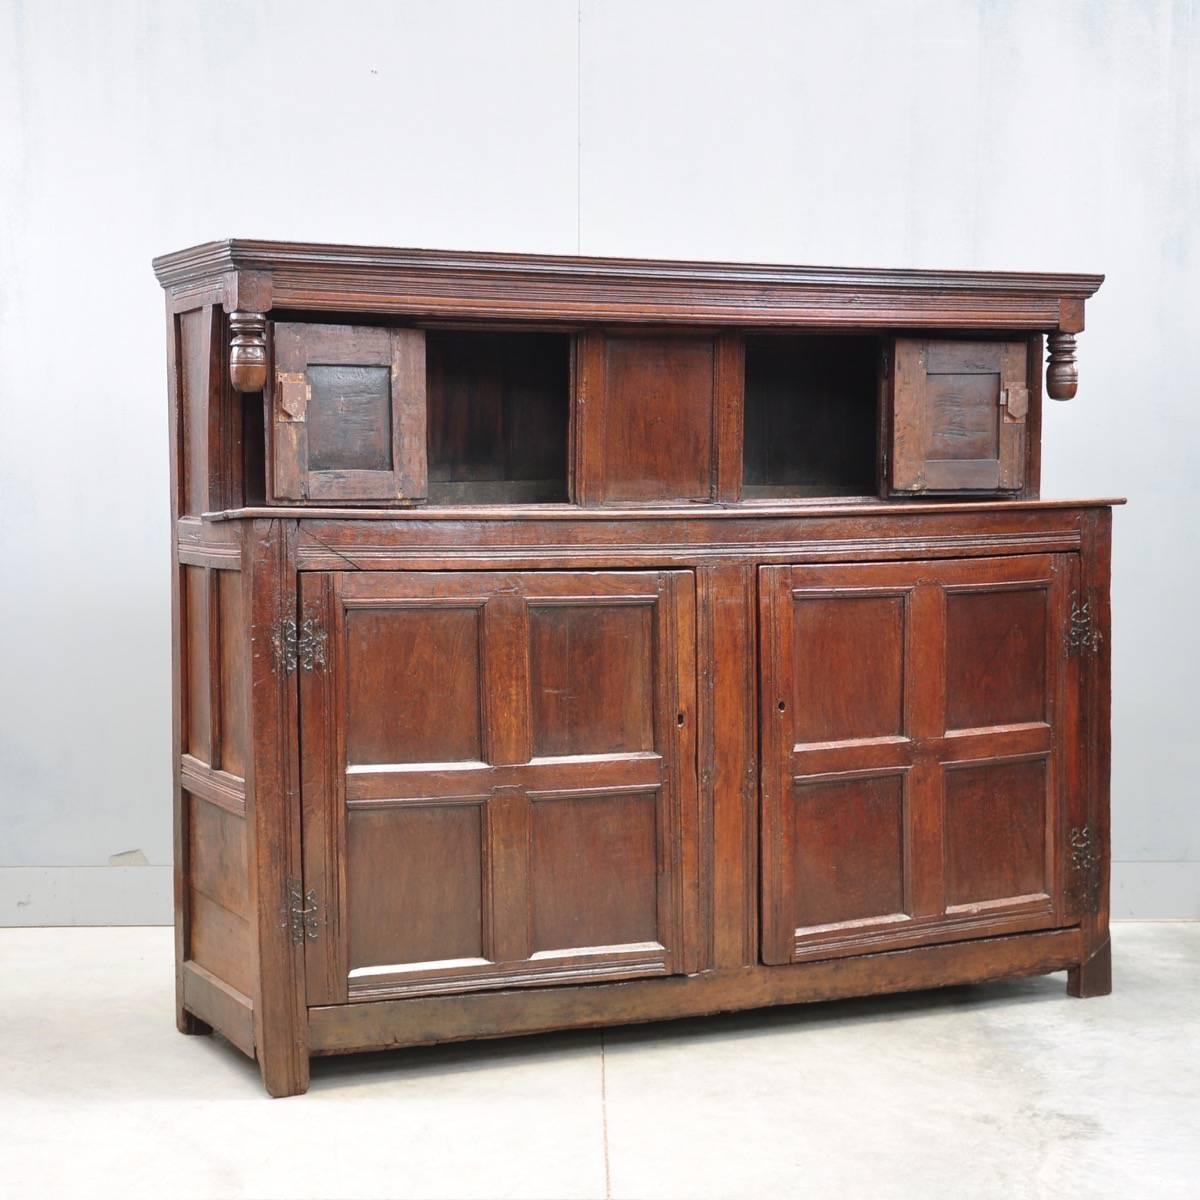 English oak court Antique cupboard   De Grande Antique Furniture - English Oak Court Cupboard De Grande Antique Furniture